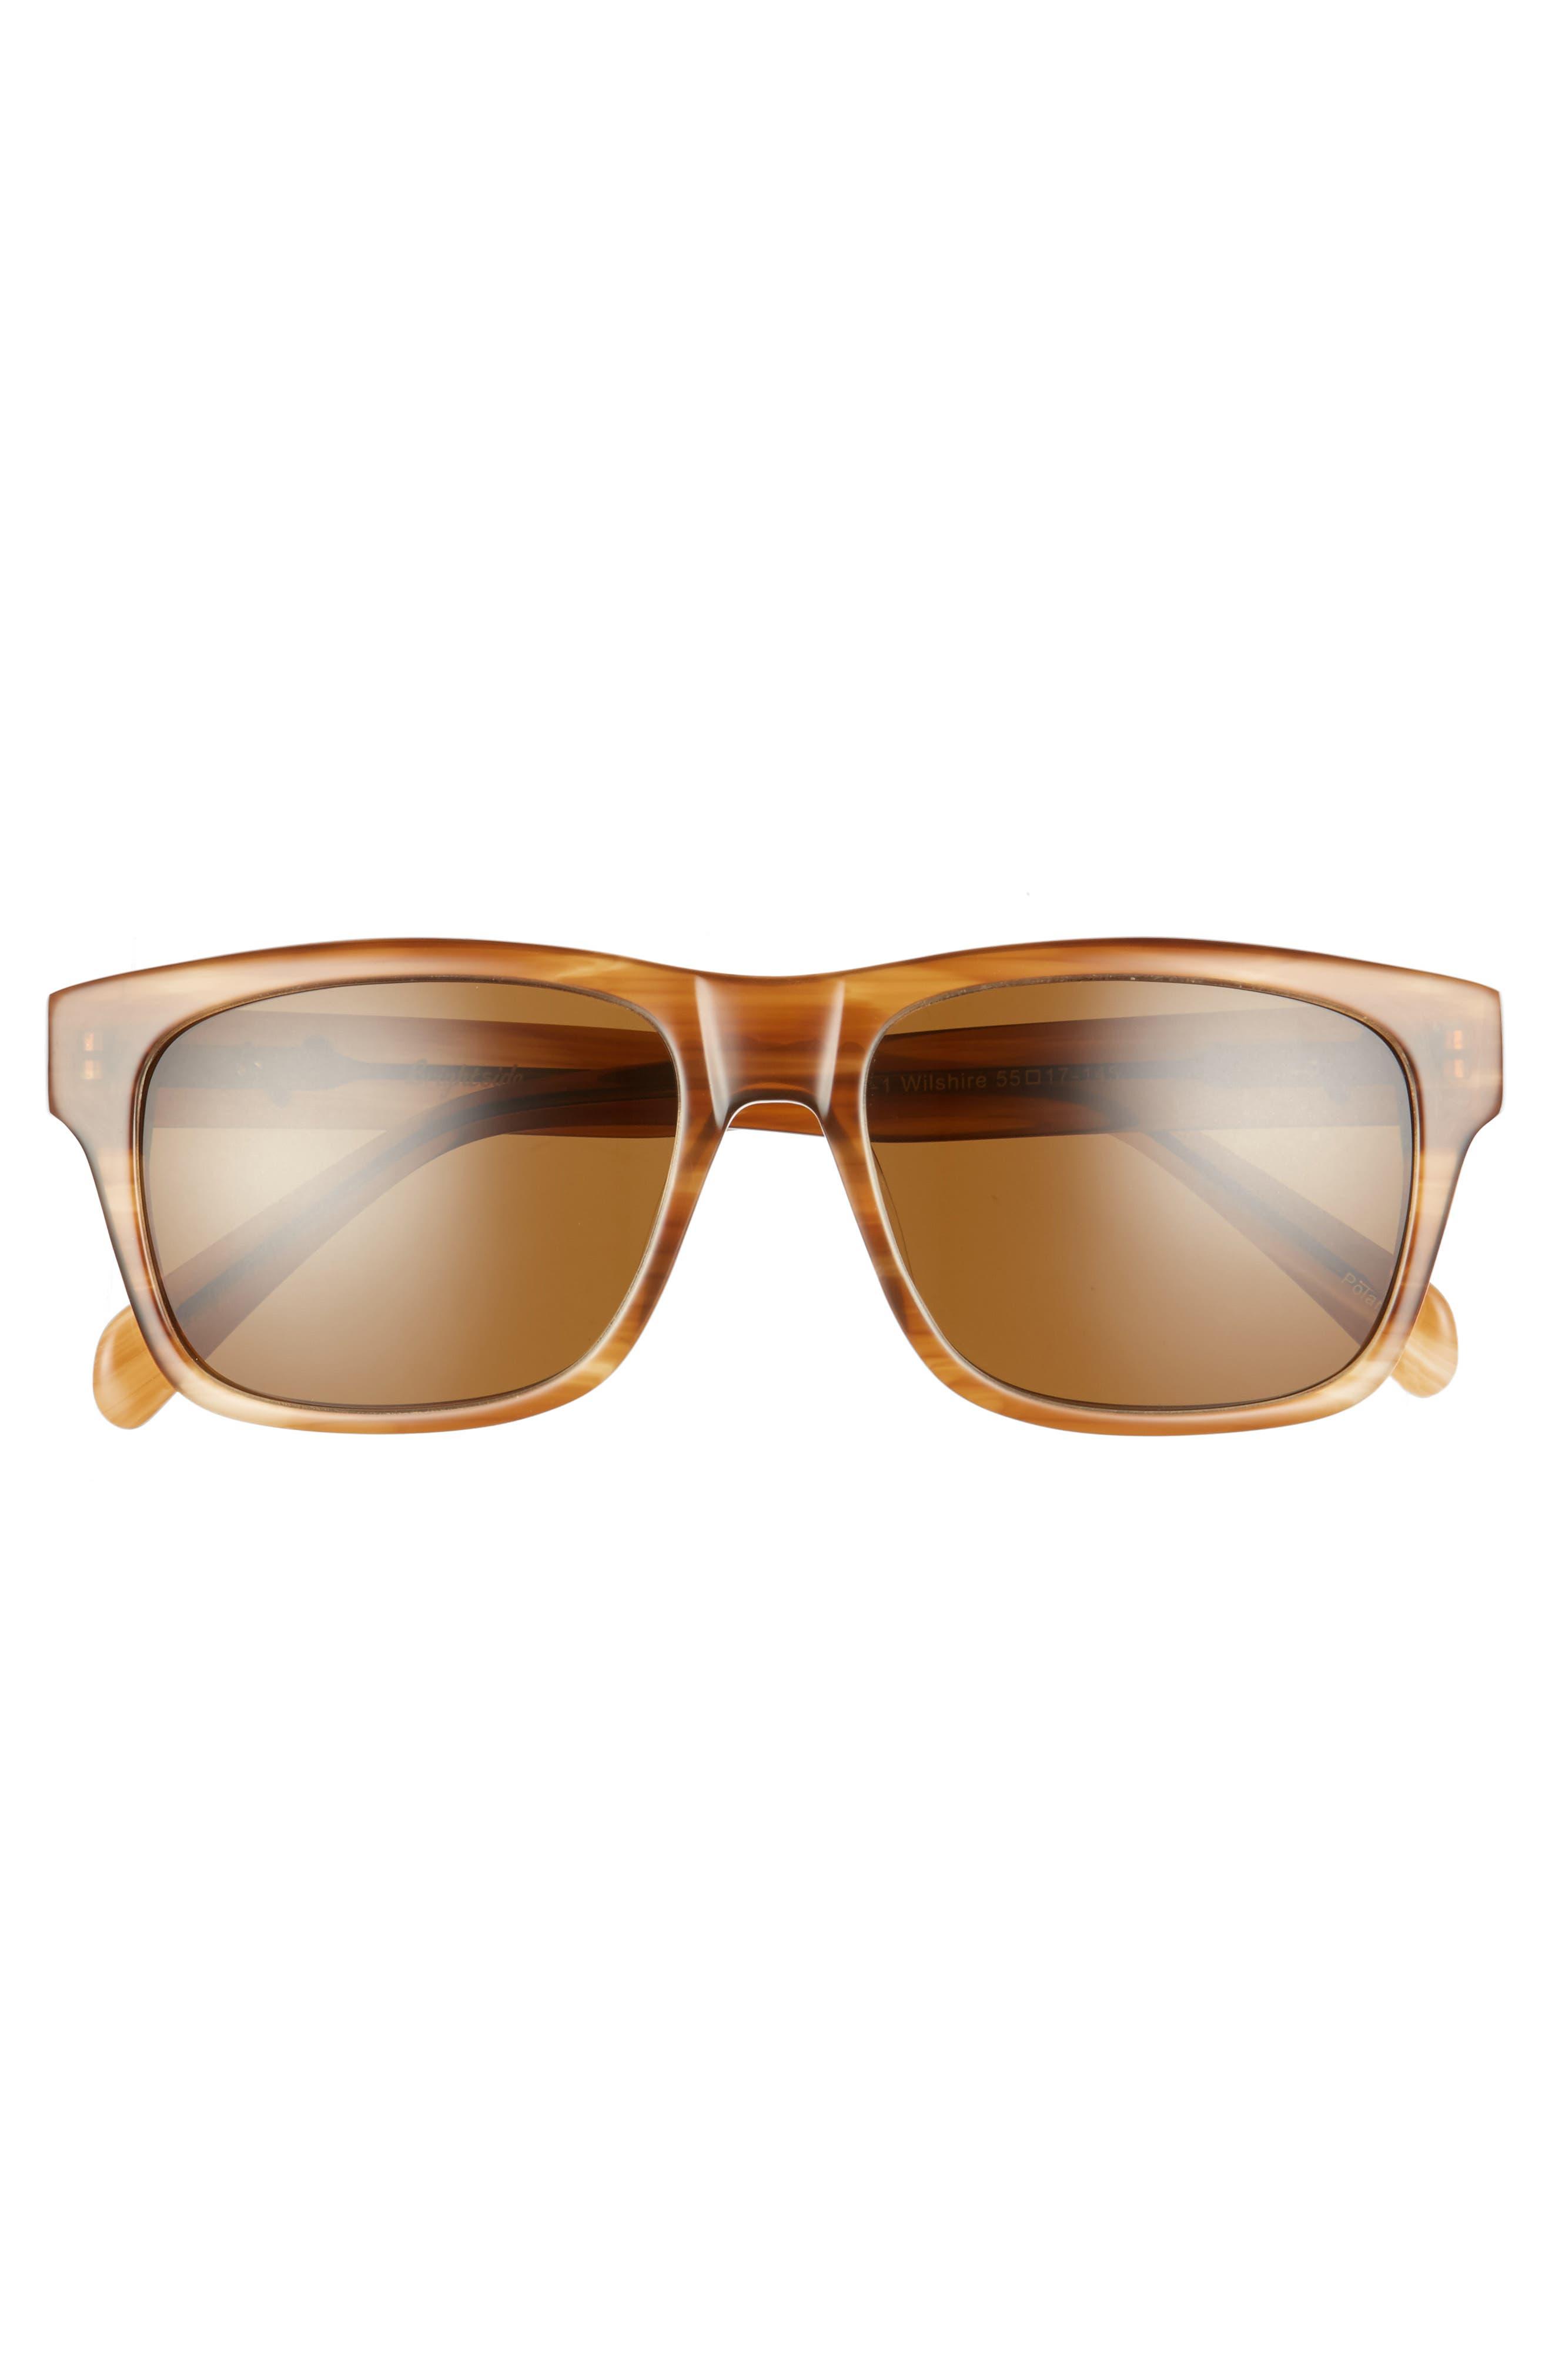 Wilshire 55mm Polarized Sunglasses,                             Alternate thumbnail 3, color,                             CEDAR/ BROWN POLAR